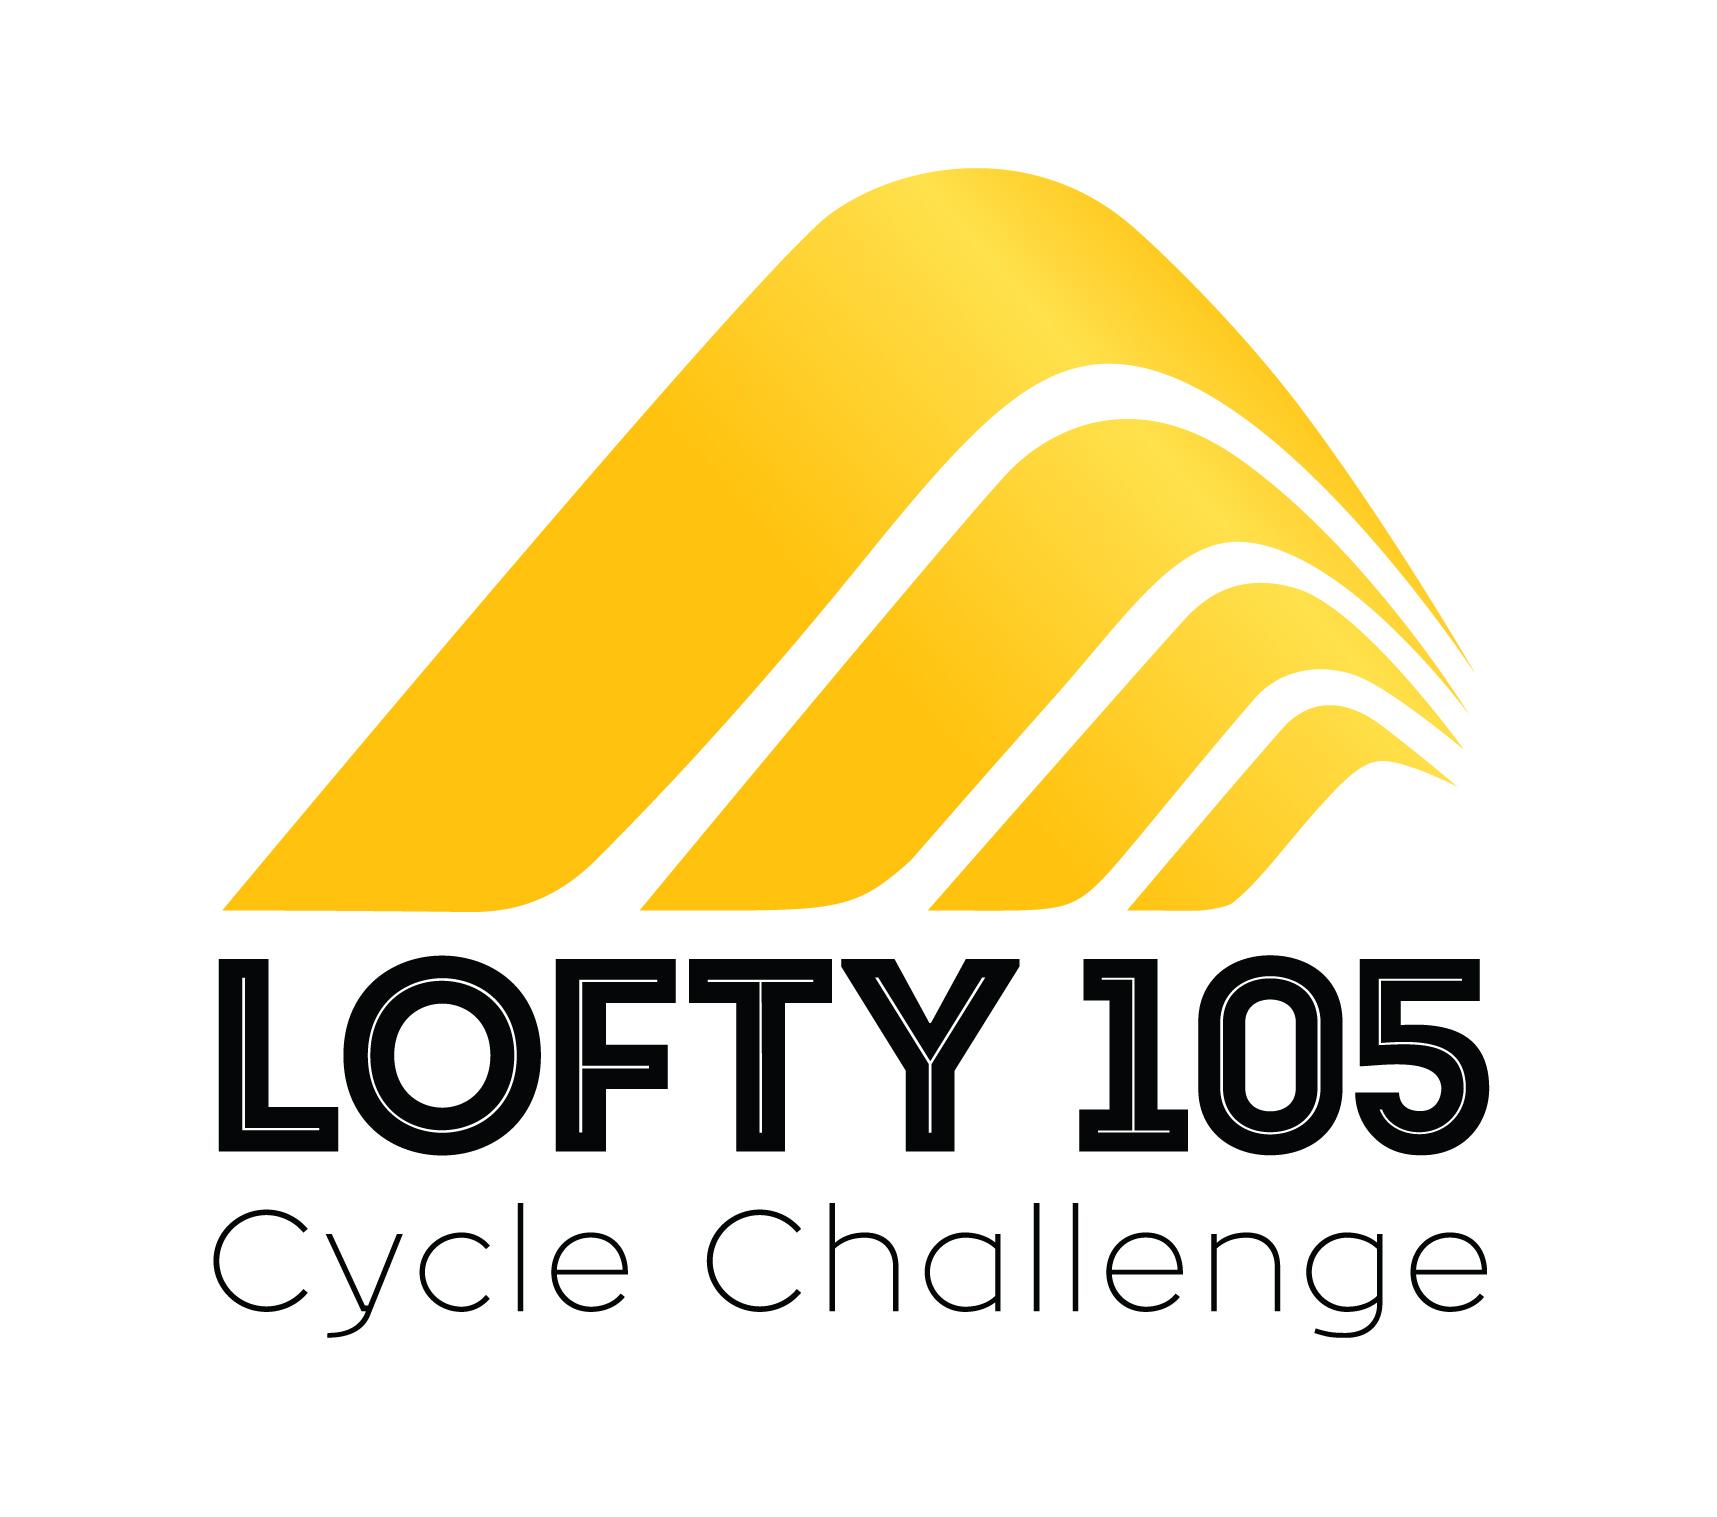 lofty105_logo-01.jpg